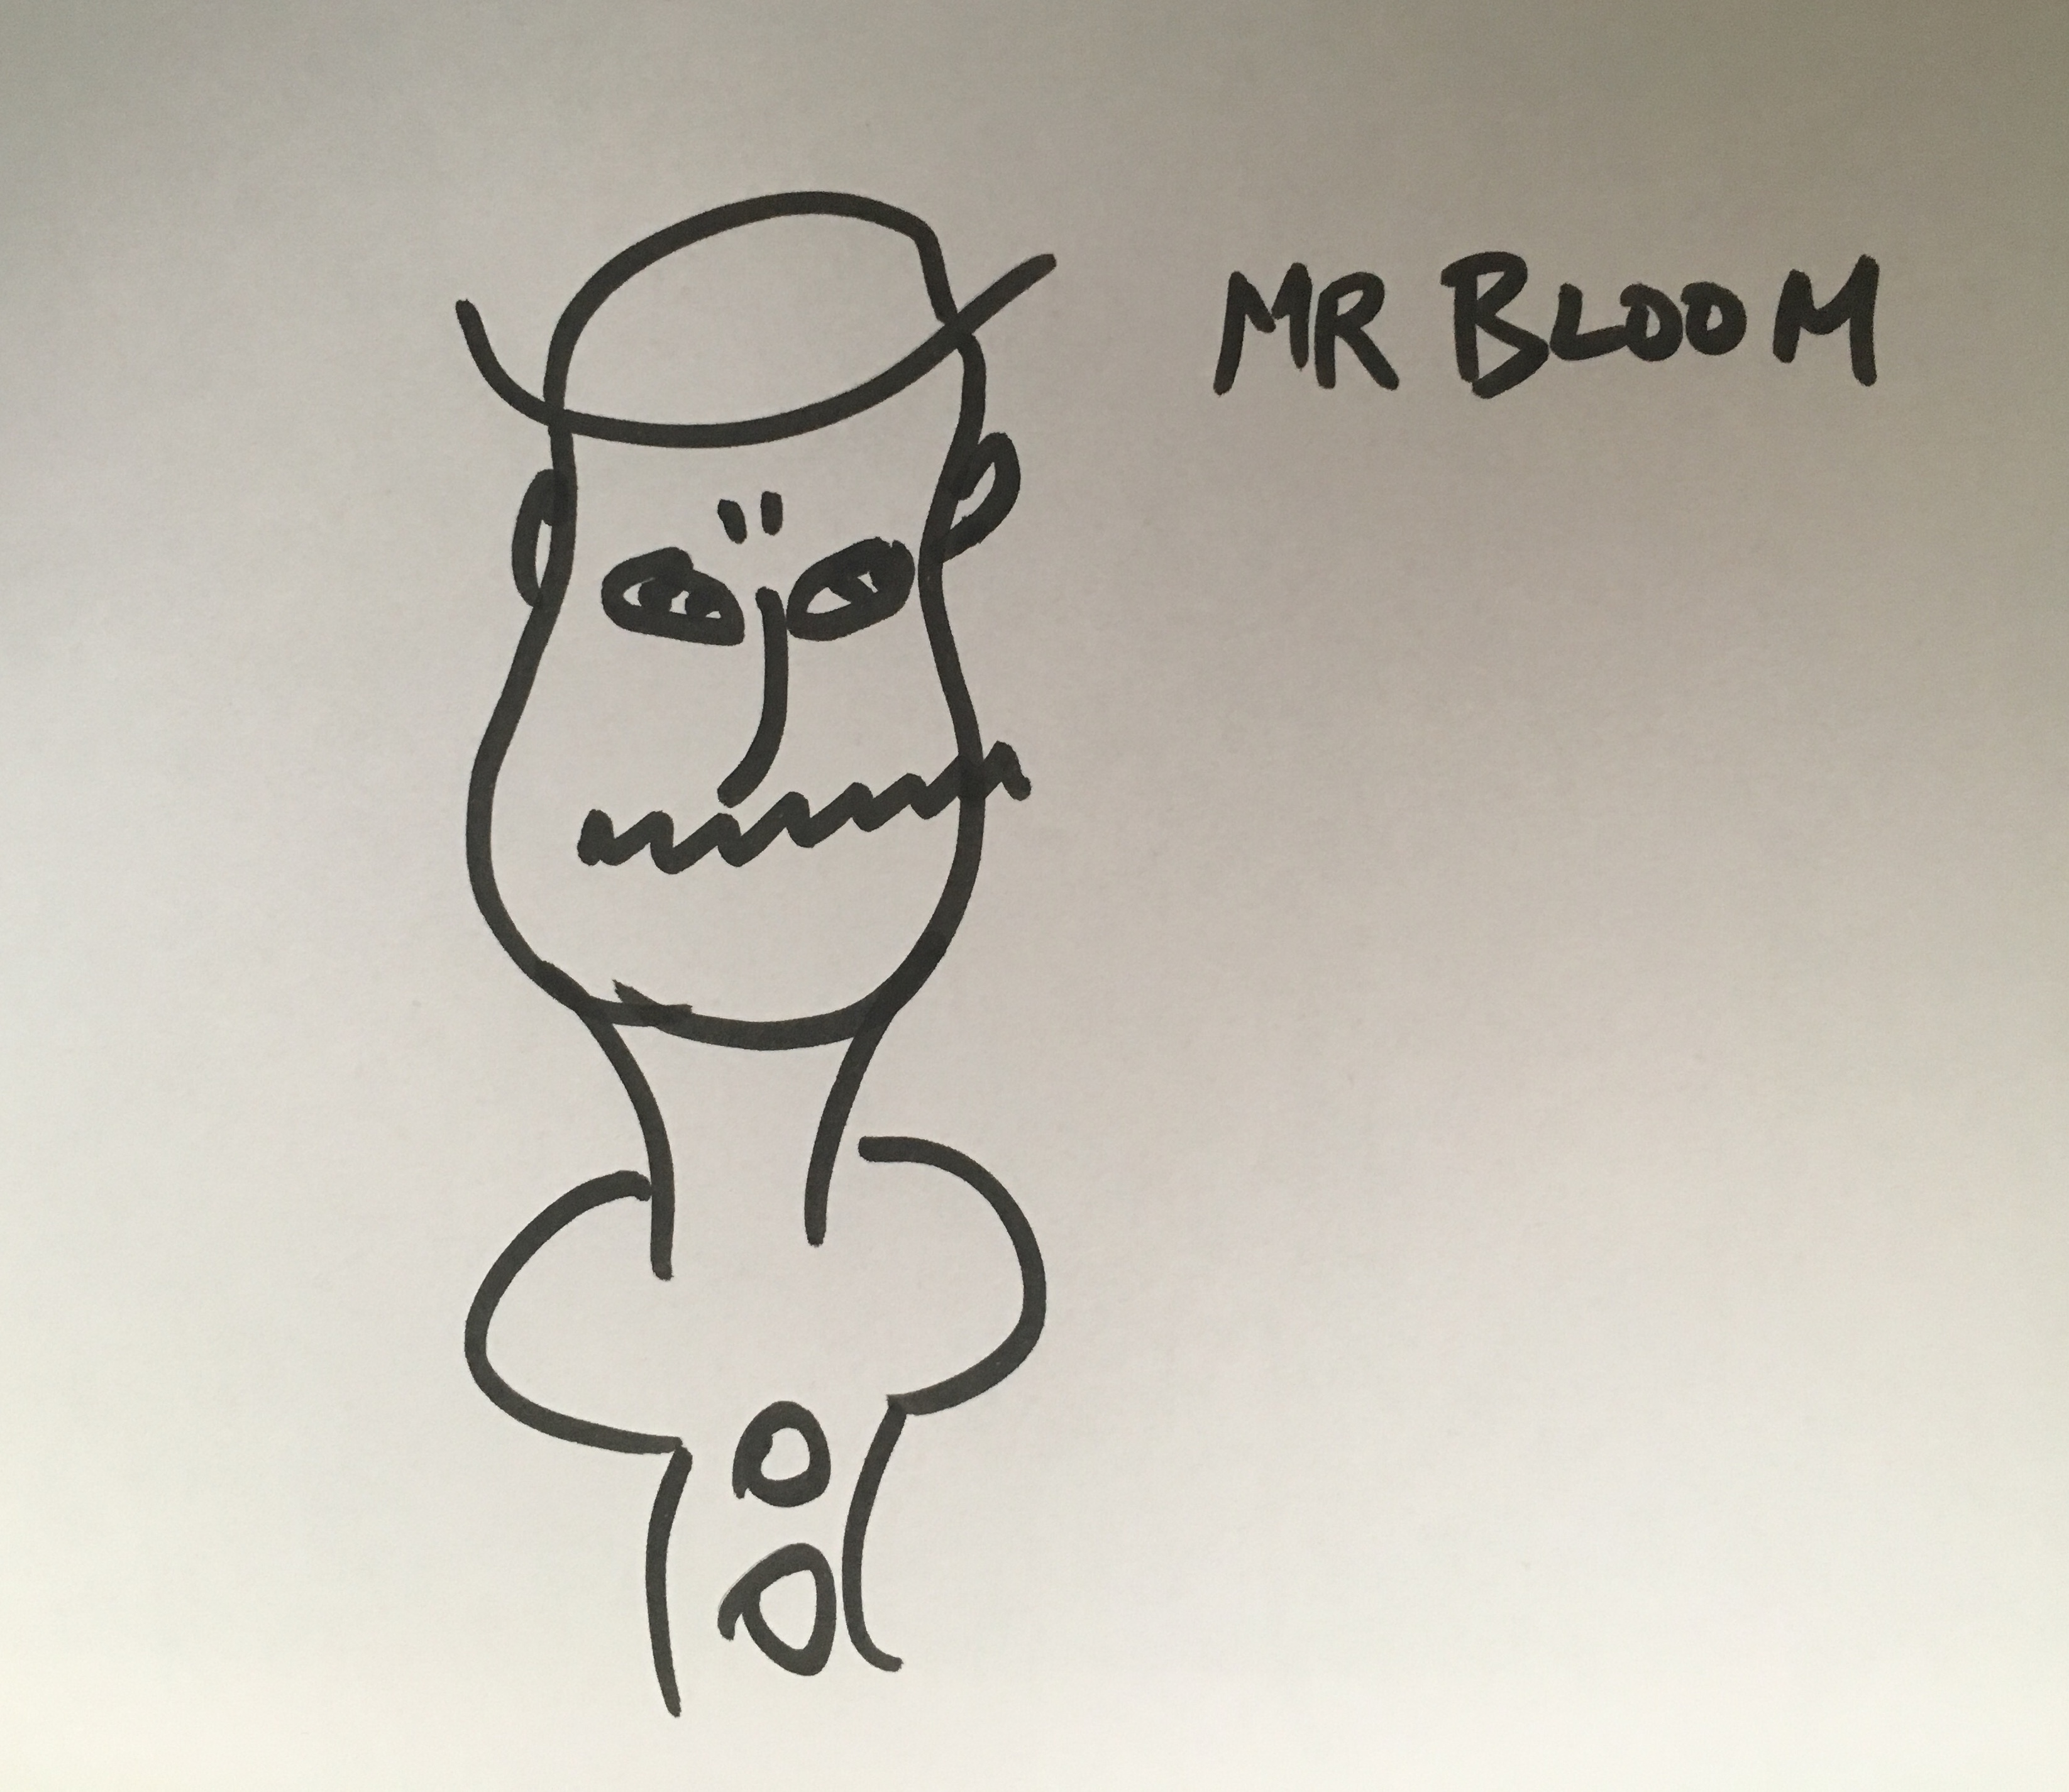 Mr Bloom